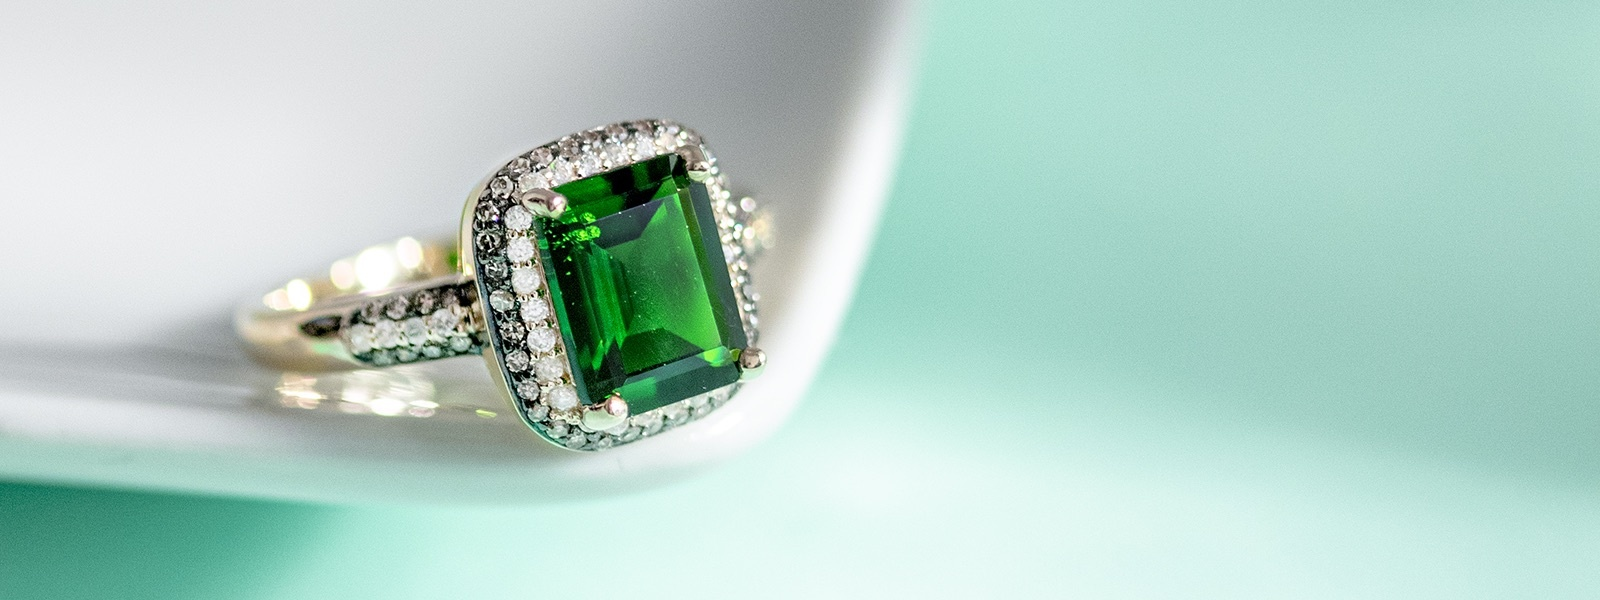 colorful gemstone jewelry